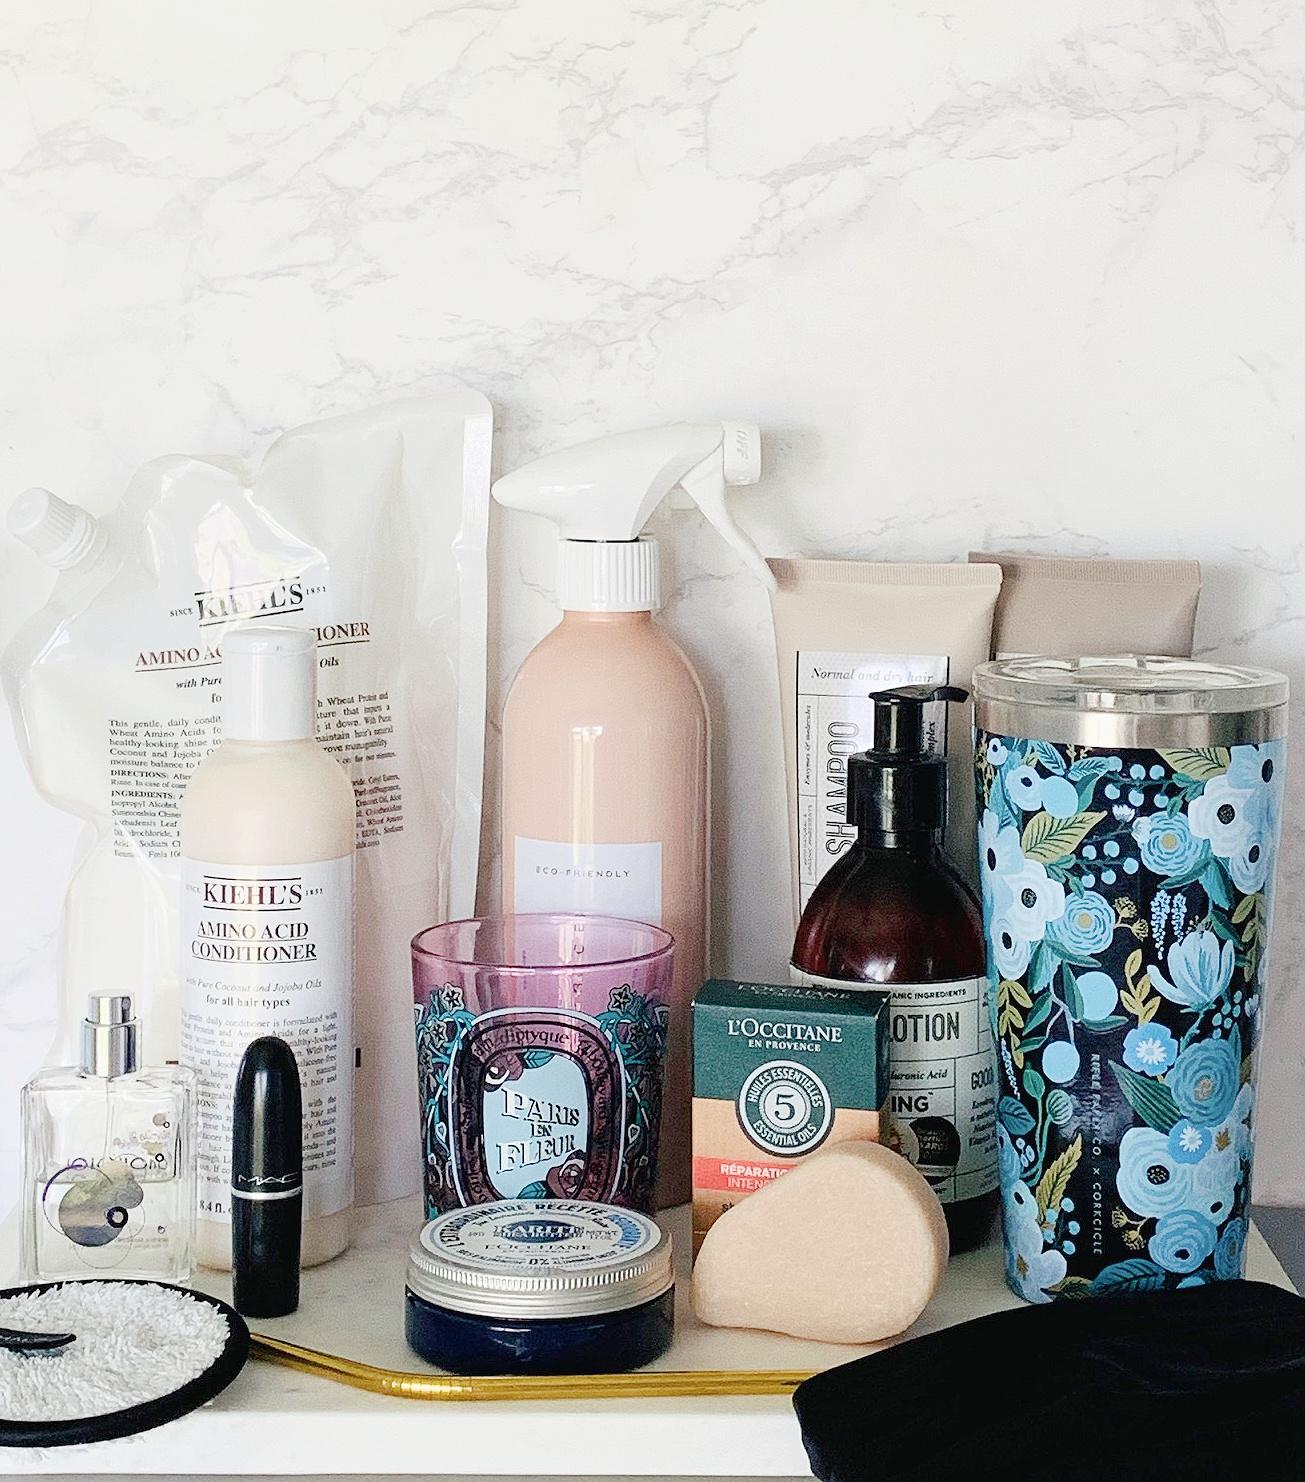 Sustainability tips, Kiehl's Refillables, L'Occitane Refillables,Shampoo Bars,